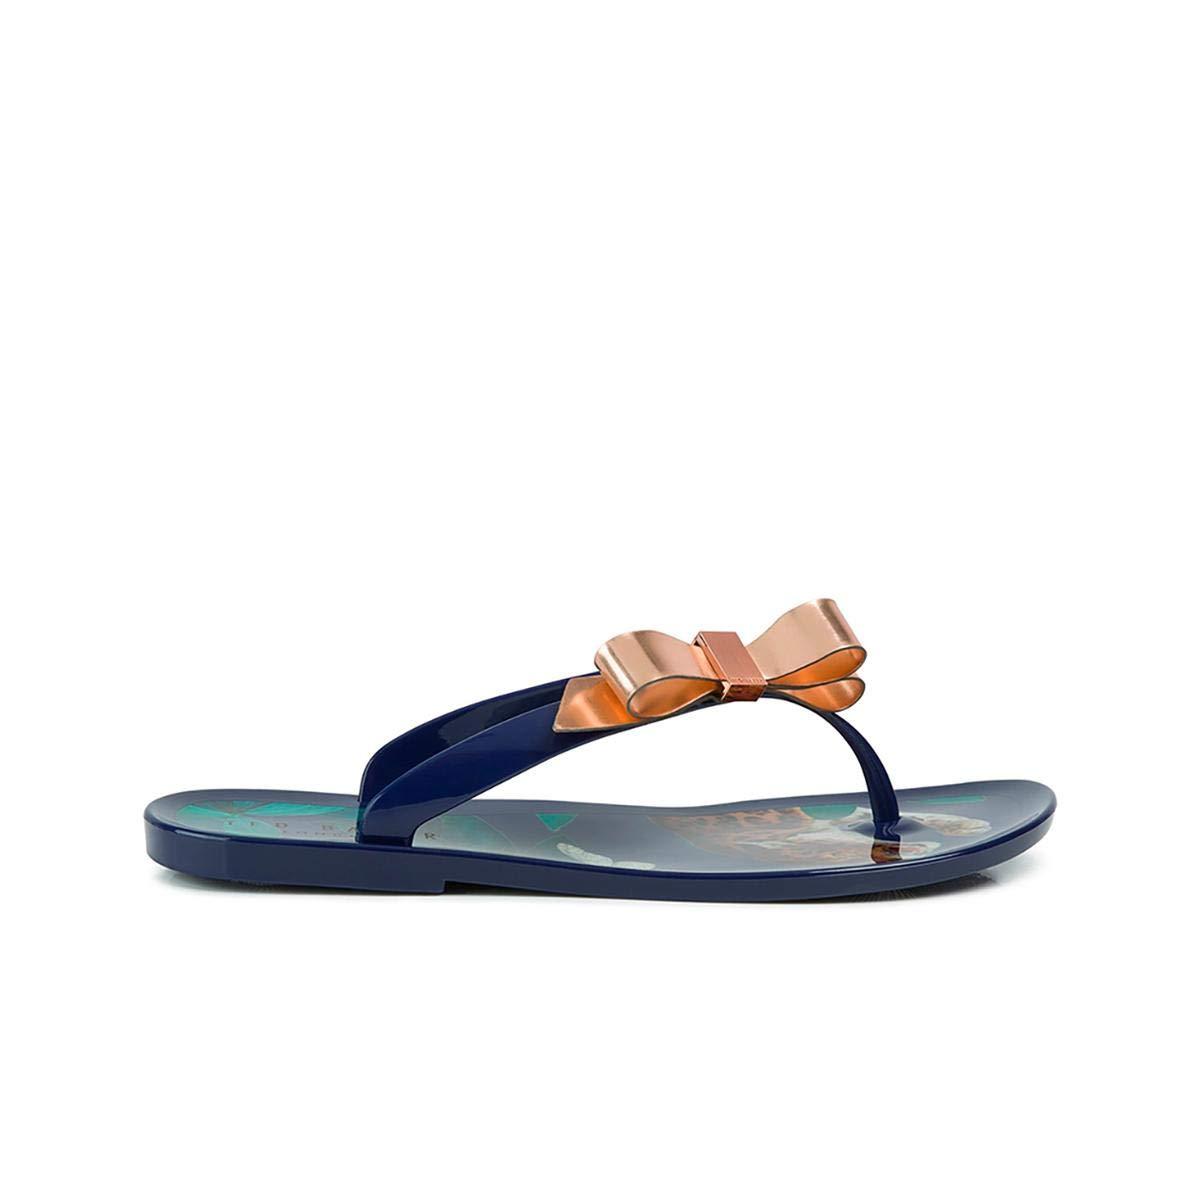 2e83a1c96 Amazon.com  Ted Baker Women s Suzzip PVC Slip On Flip Flop Navy Houdini   Shoes